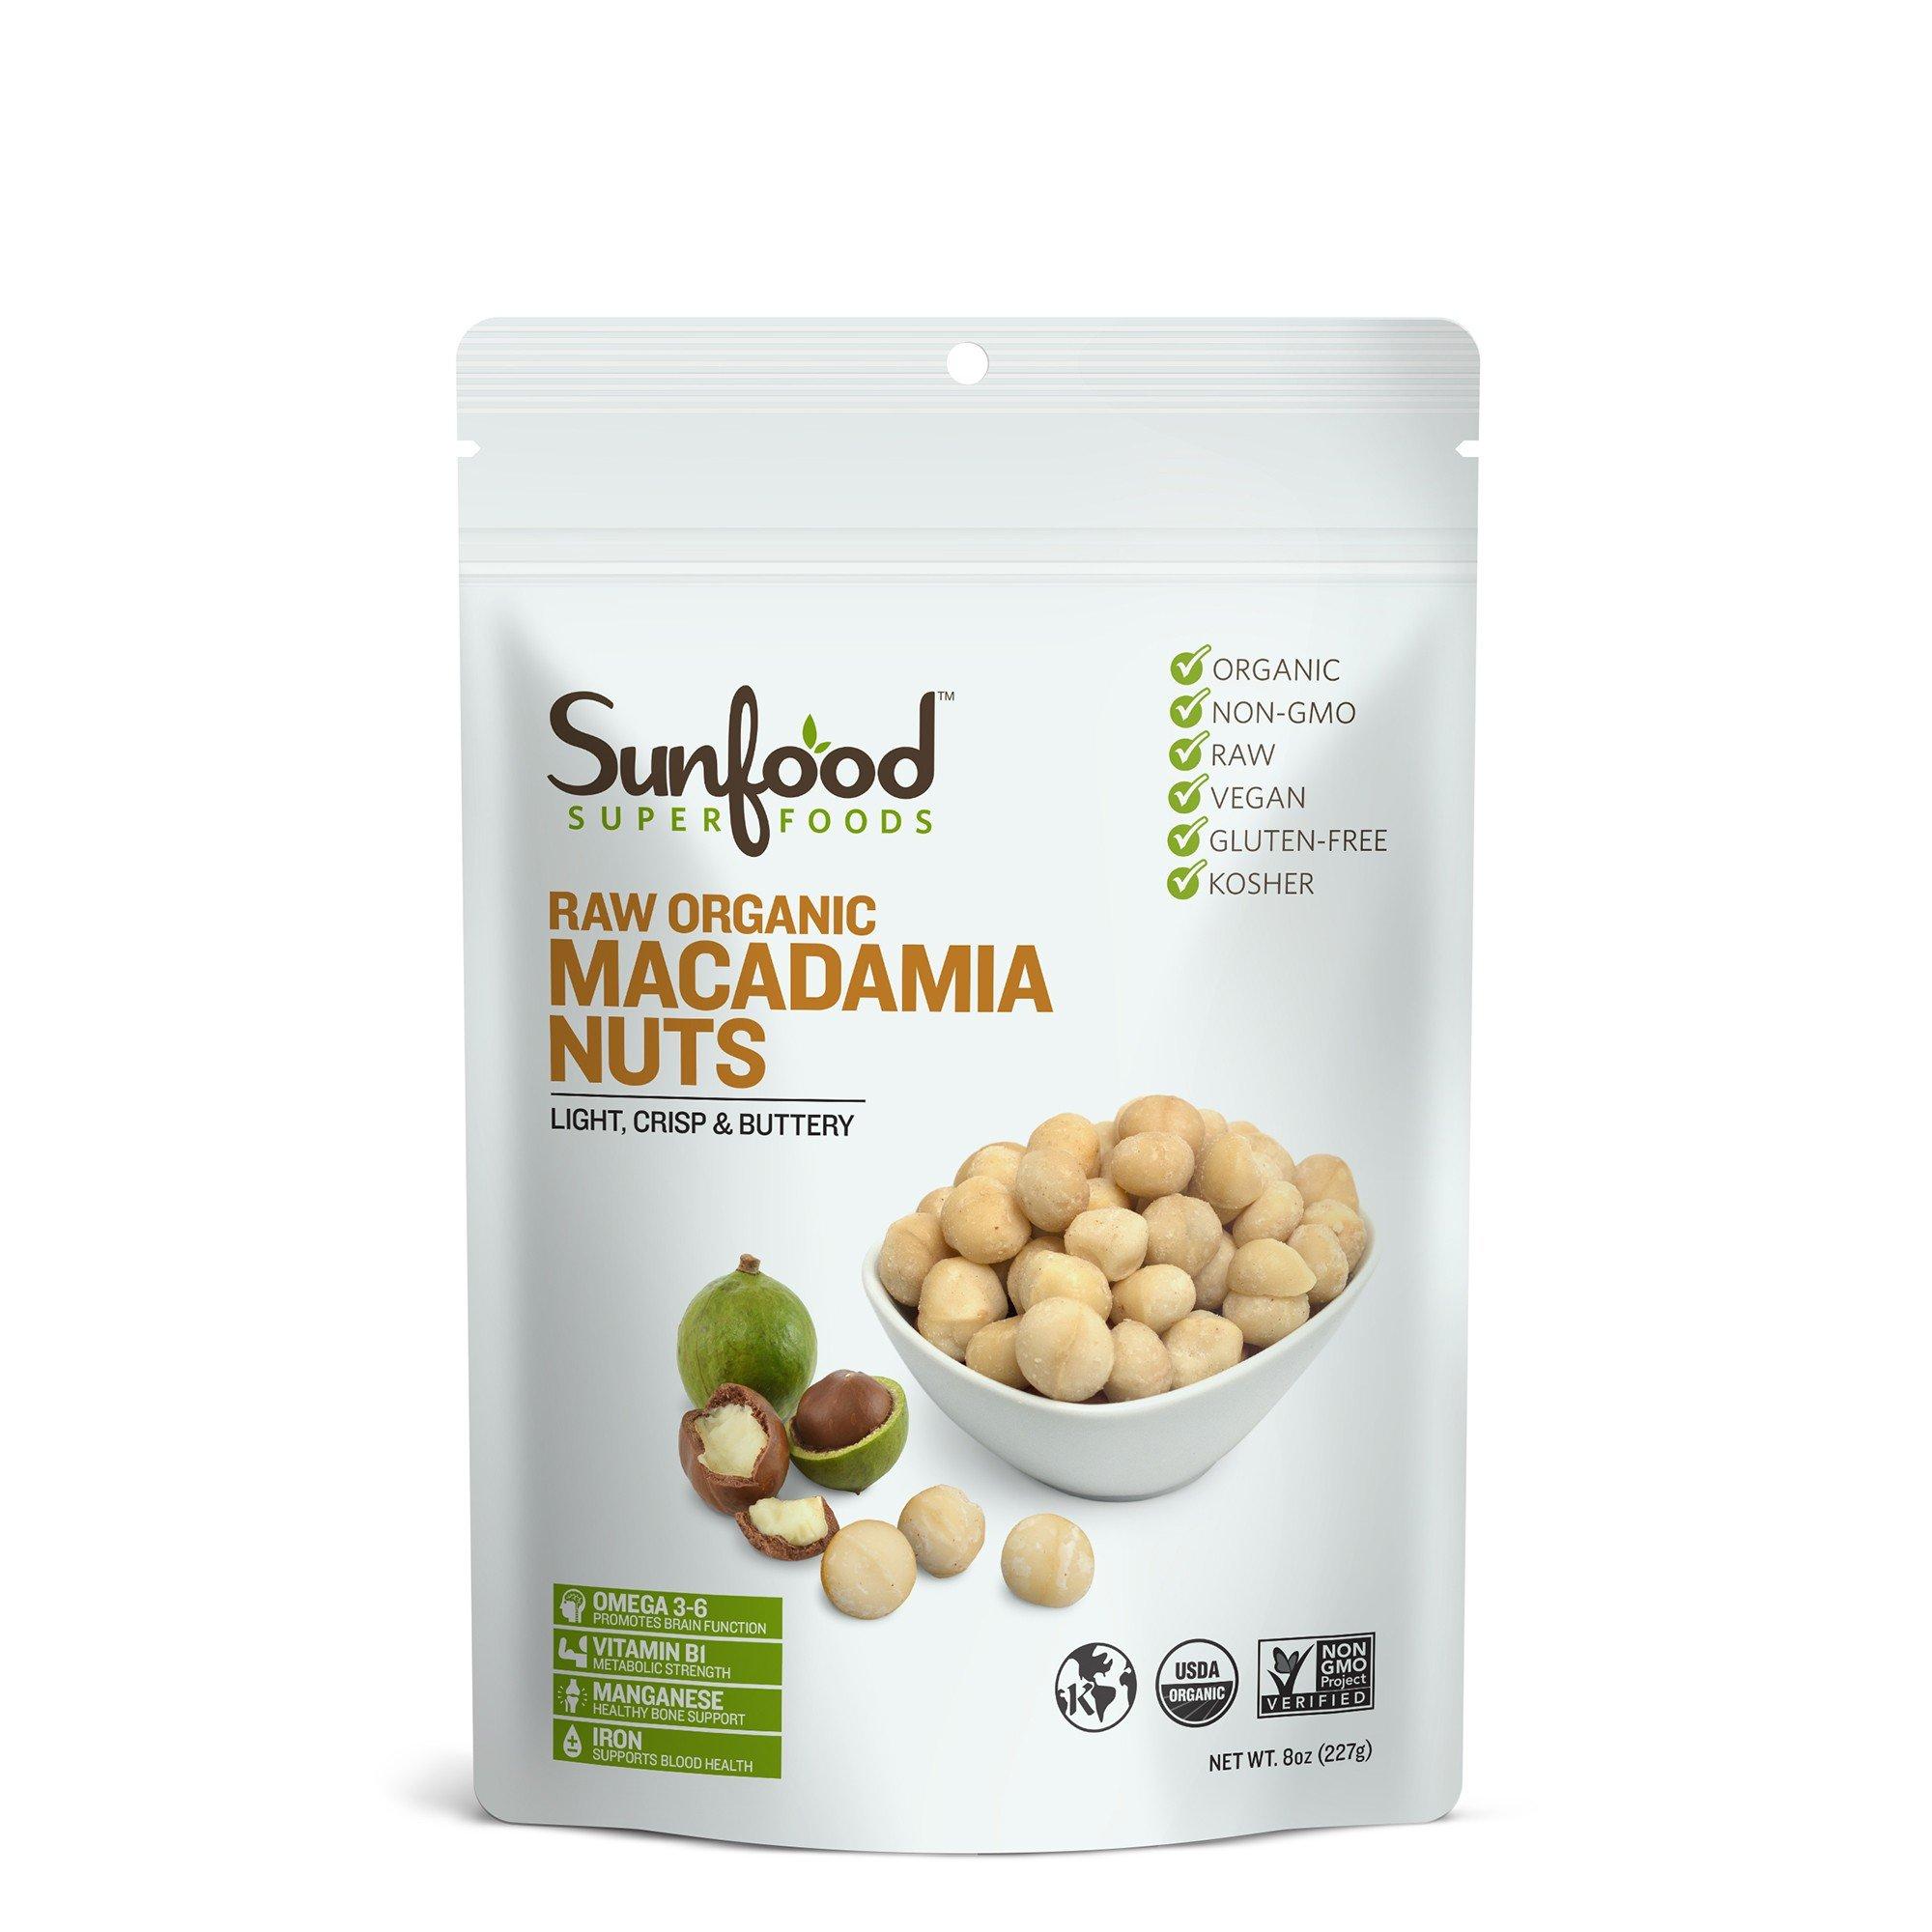 Sunfood Macadamia Nuts, 8oz, Raw, Organic